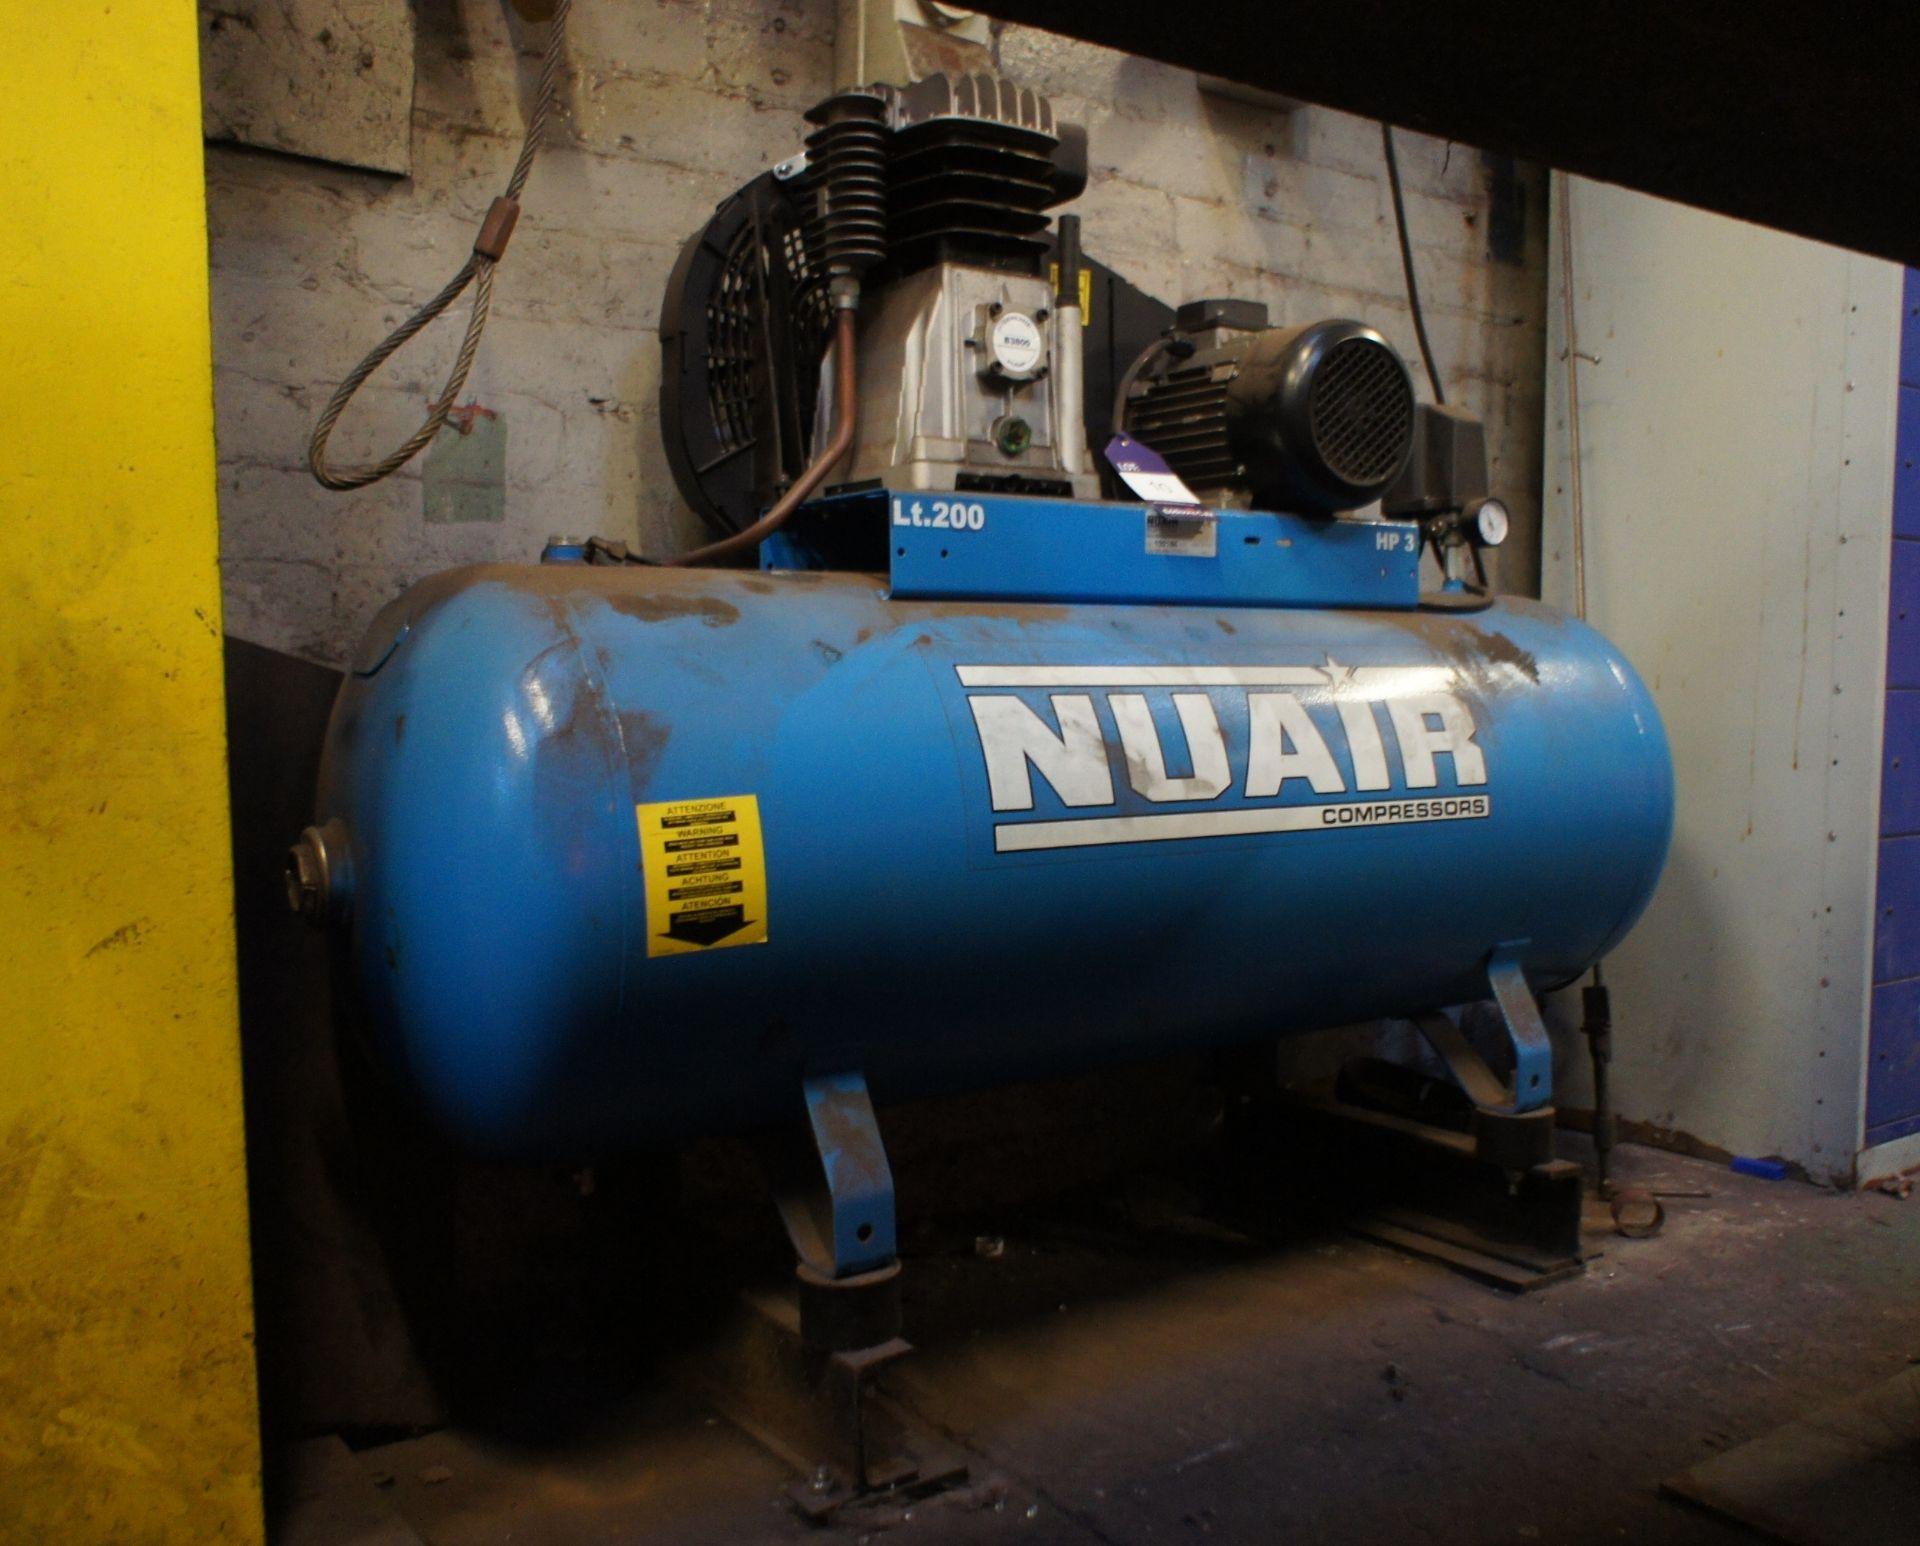 Nuair HP3 Receiver mounted Workshop Compressor, 20